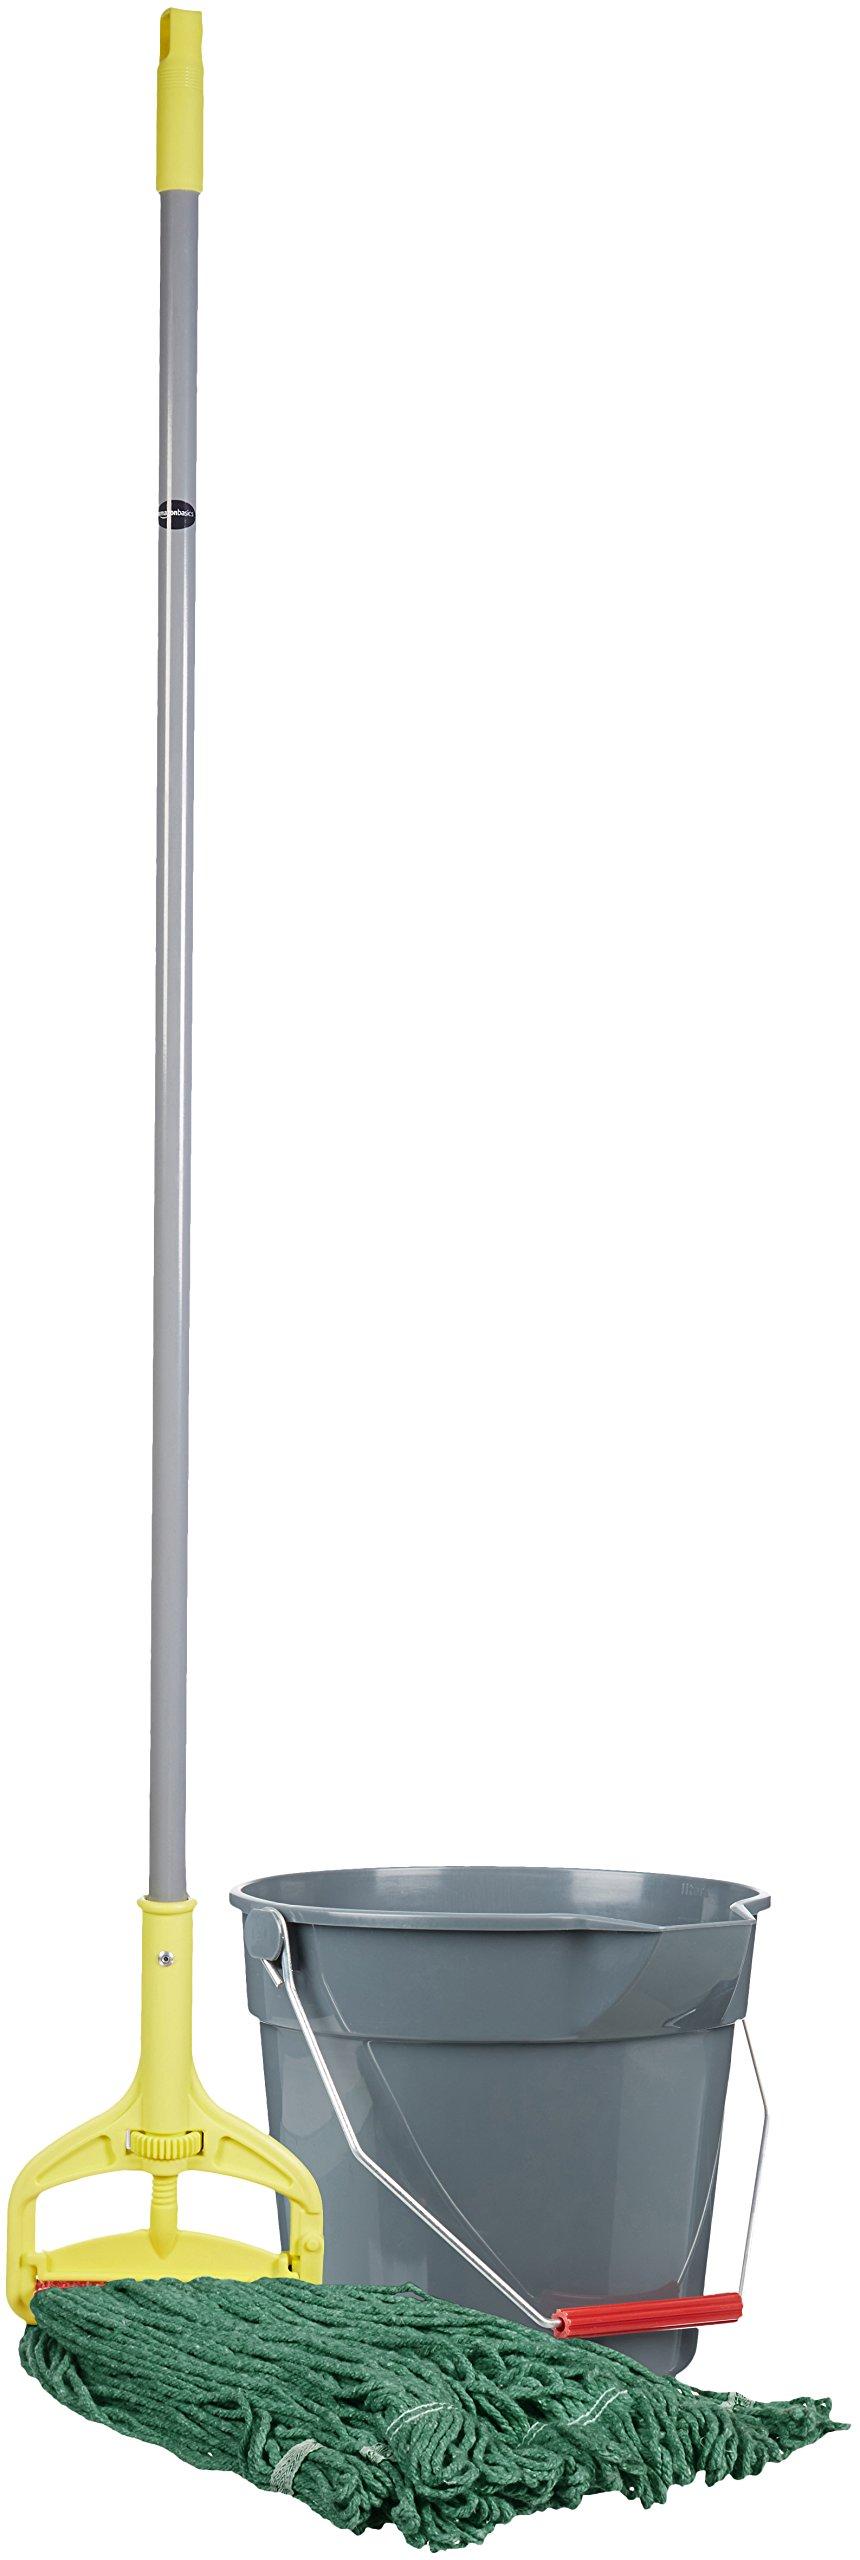 AmazonBasics Loop-End Synthetic Mop Head, 1.25-Inch Headband, Medium, Green - 6-Pack by AmazonBasics (Image #3)